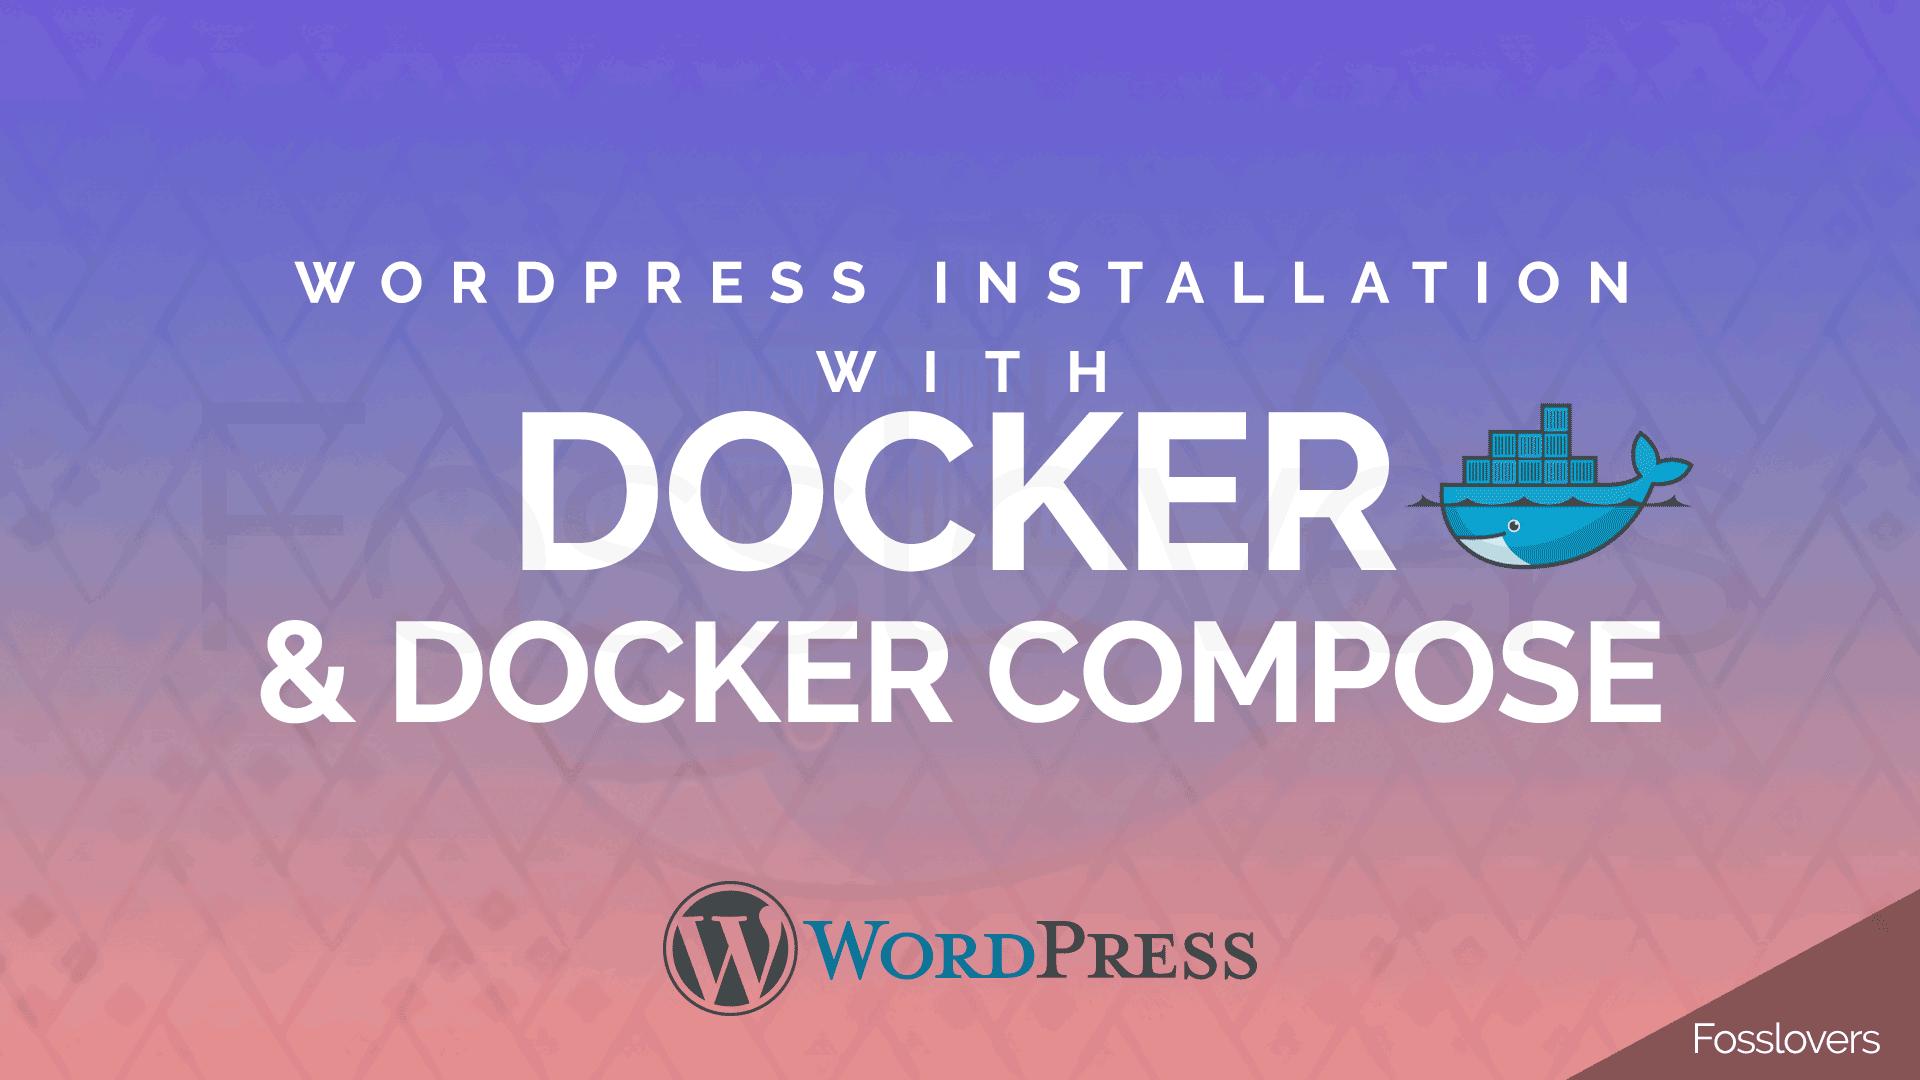 WordPress installation with Docker and Docker Compose Fosslovers